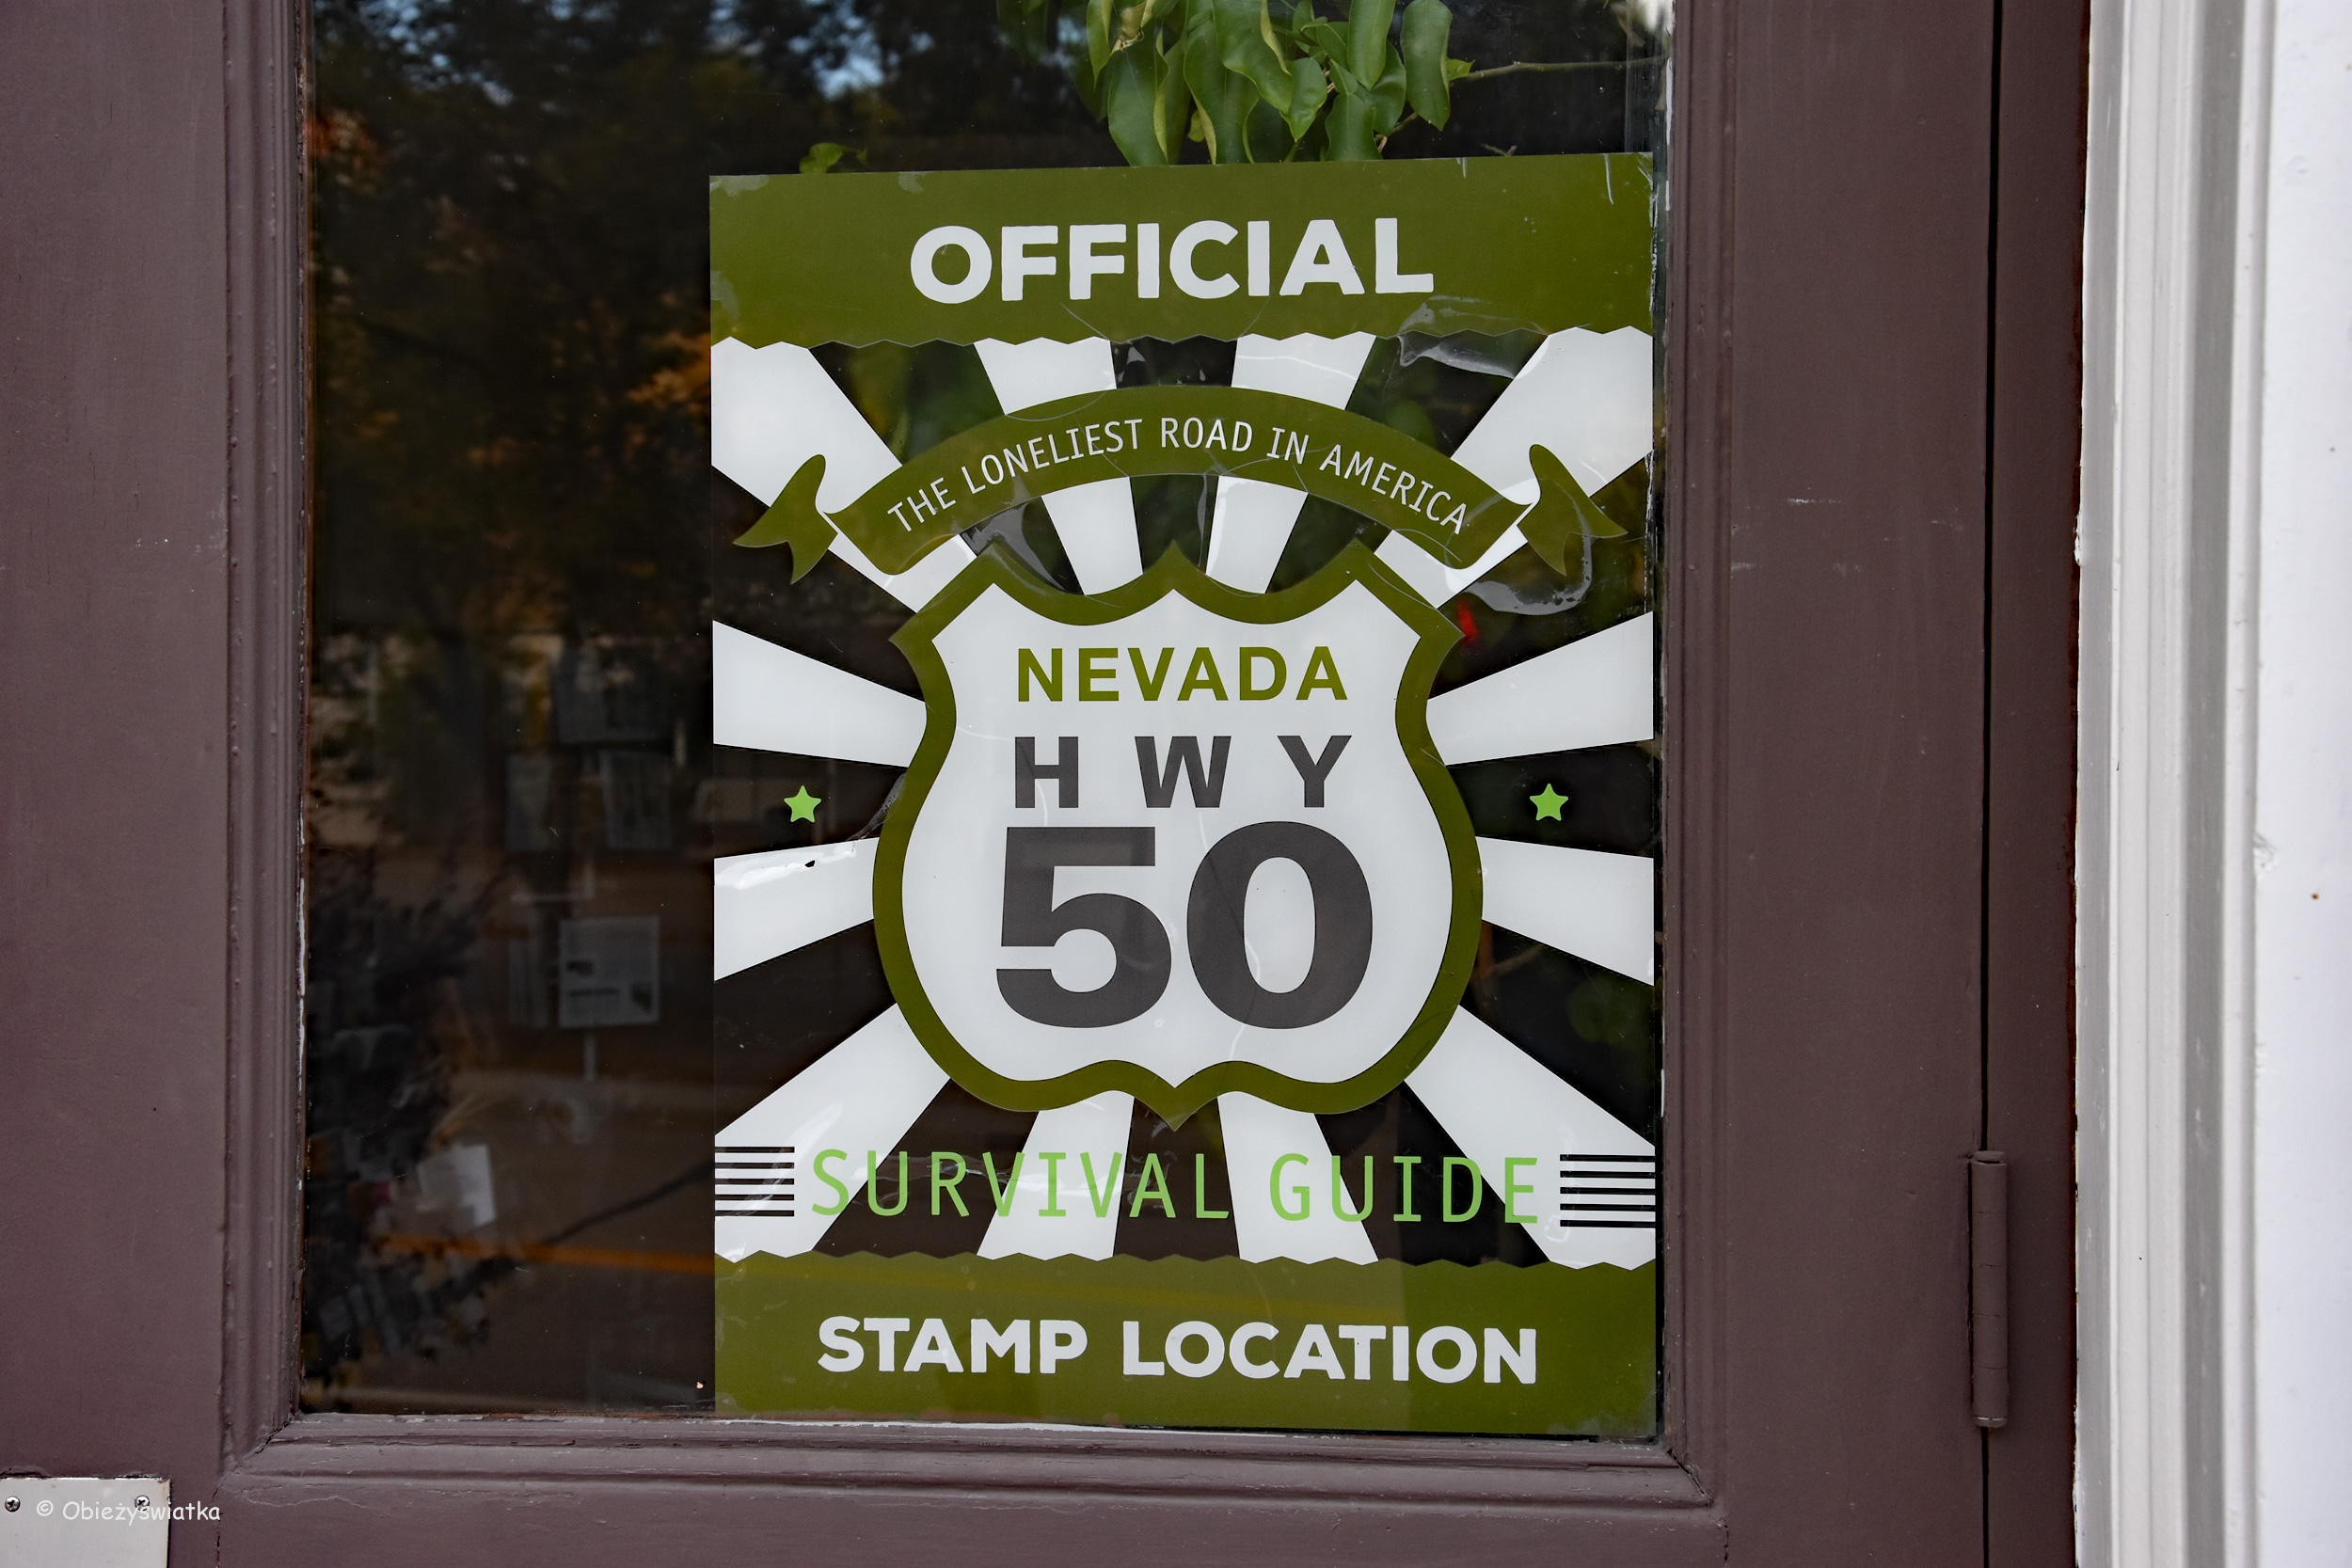 Highway 50, Stamp Location, Nevada